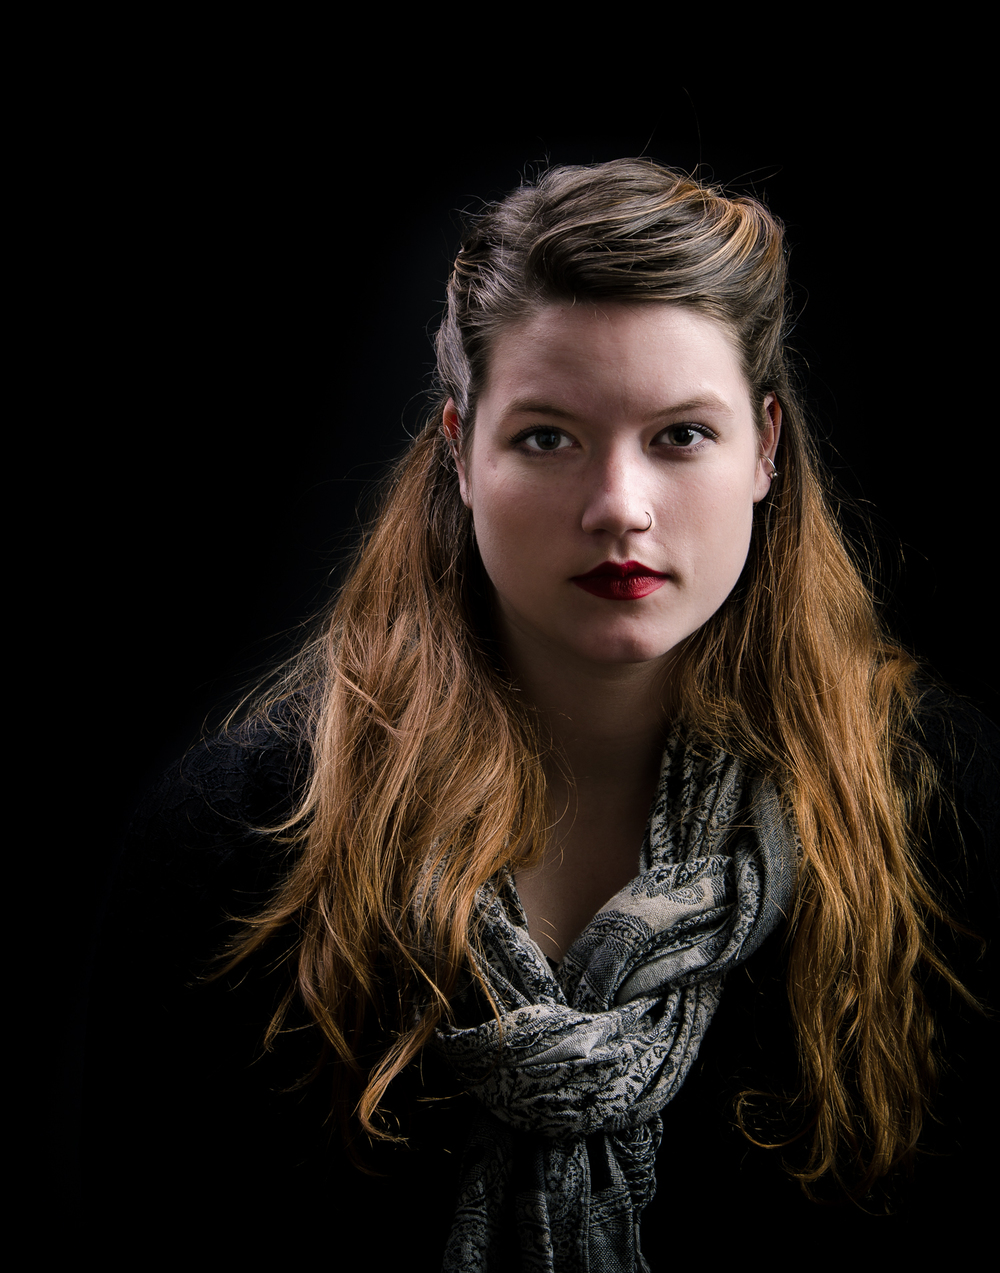 Portrait-Fine-Art-Photography-Jay-Lansford-003.jpg